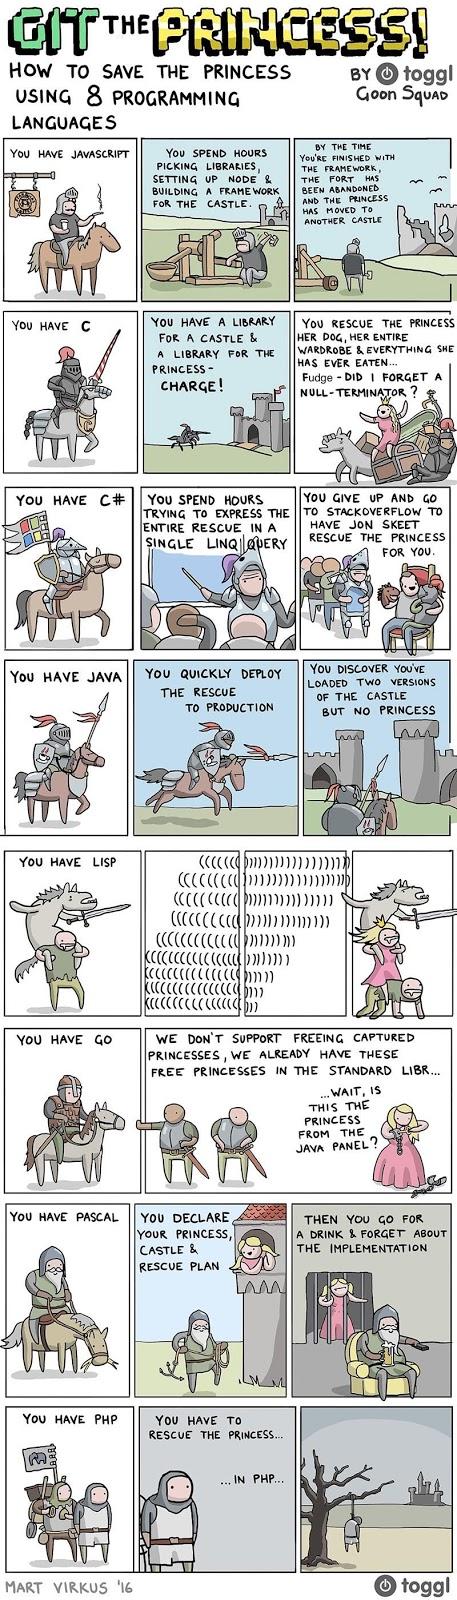 Какой язык программирования стоит выучить первым? (ʇdıɹɔsɐʌɐɾ: ɯǝʚɯо ņıqнqvиʚɐdu) - 3